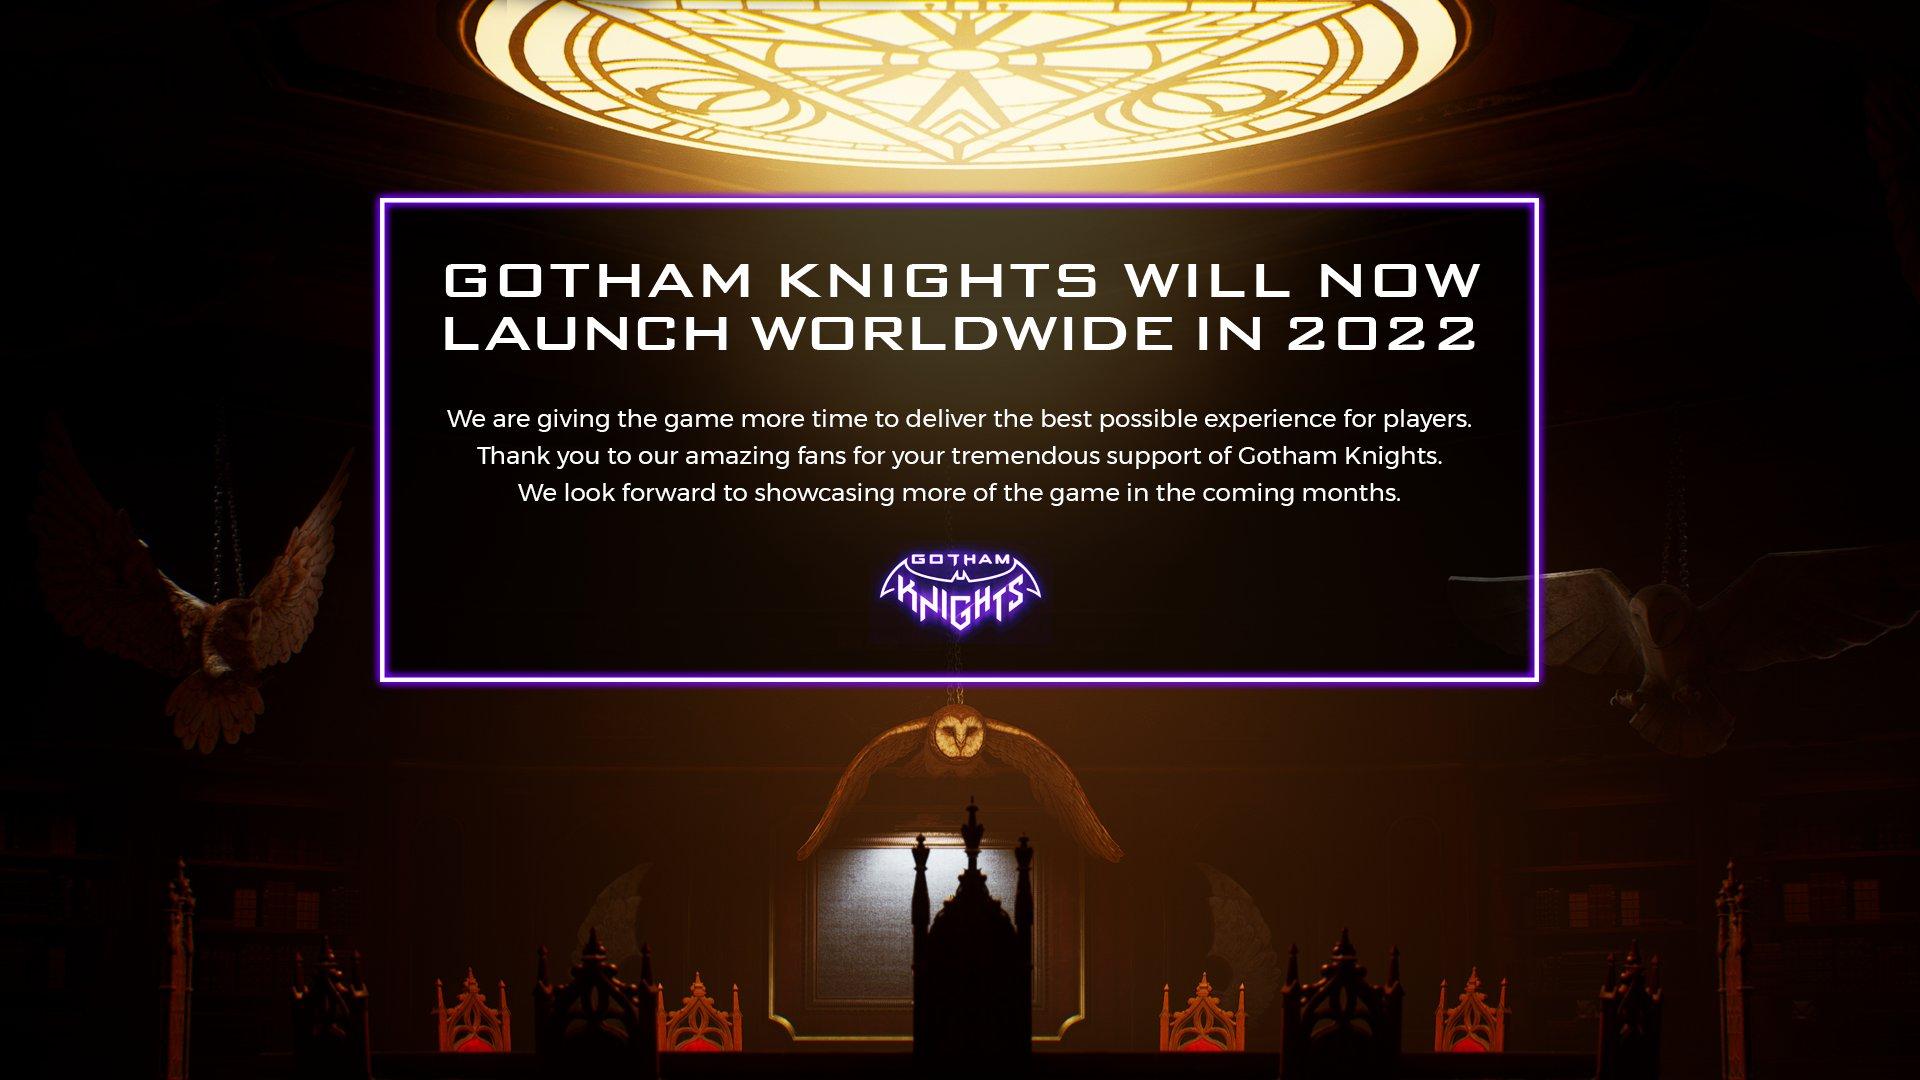 gotham knights rinviato